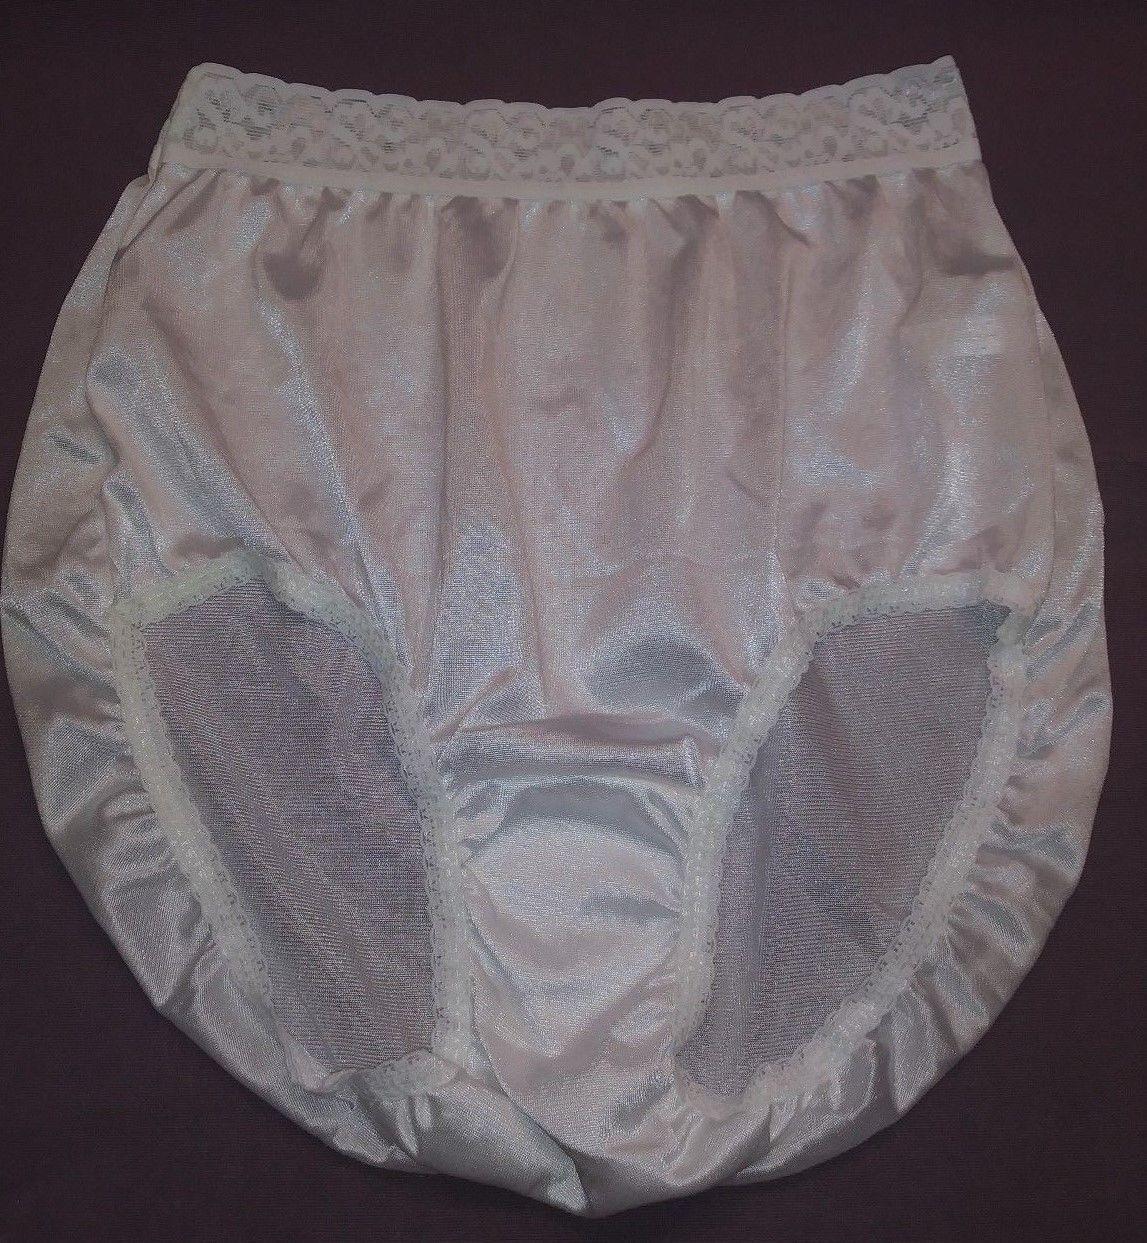 4 Pair Size 6 BLACK 100/% Nylon Panties Carole Brief Panty Made in the USA